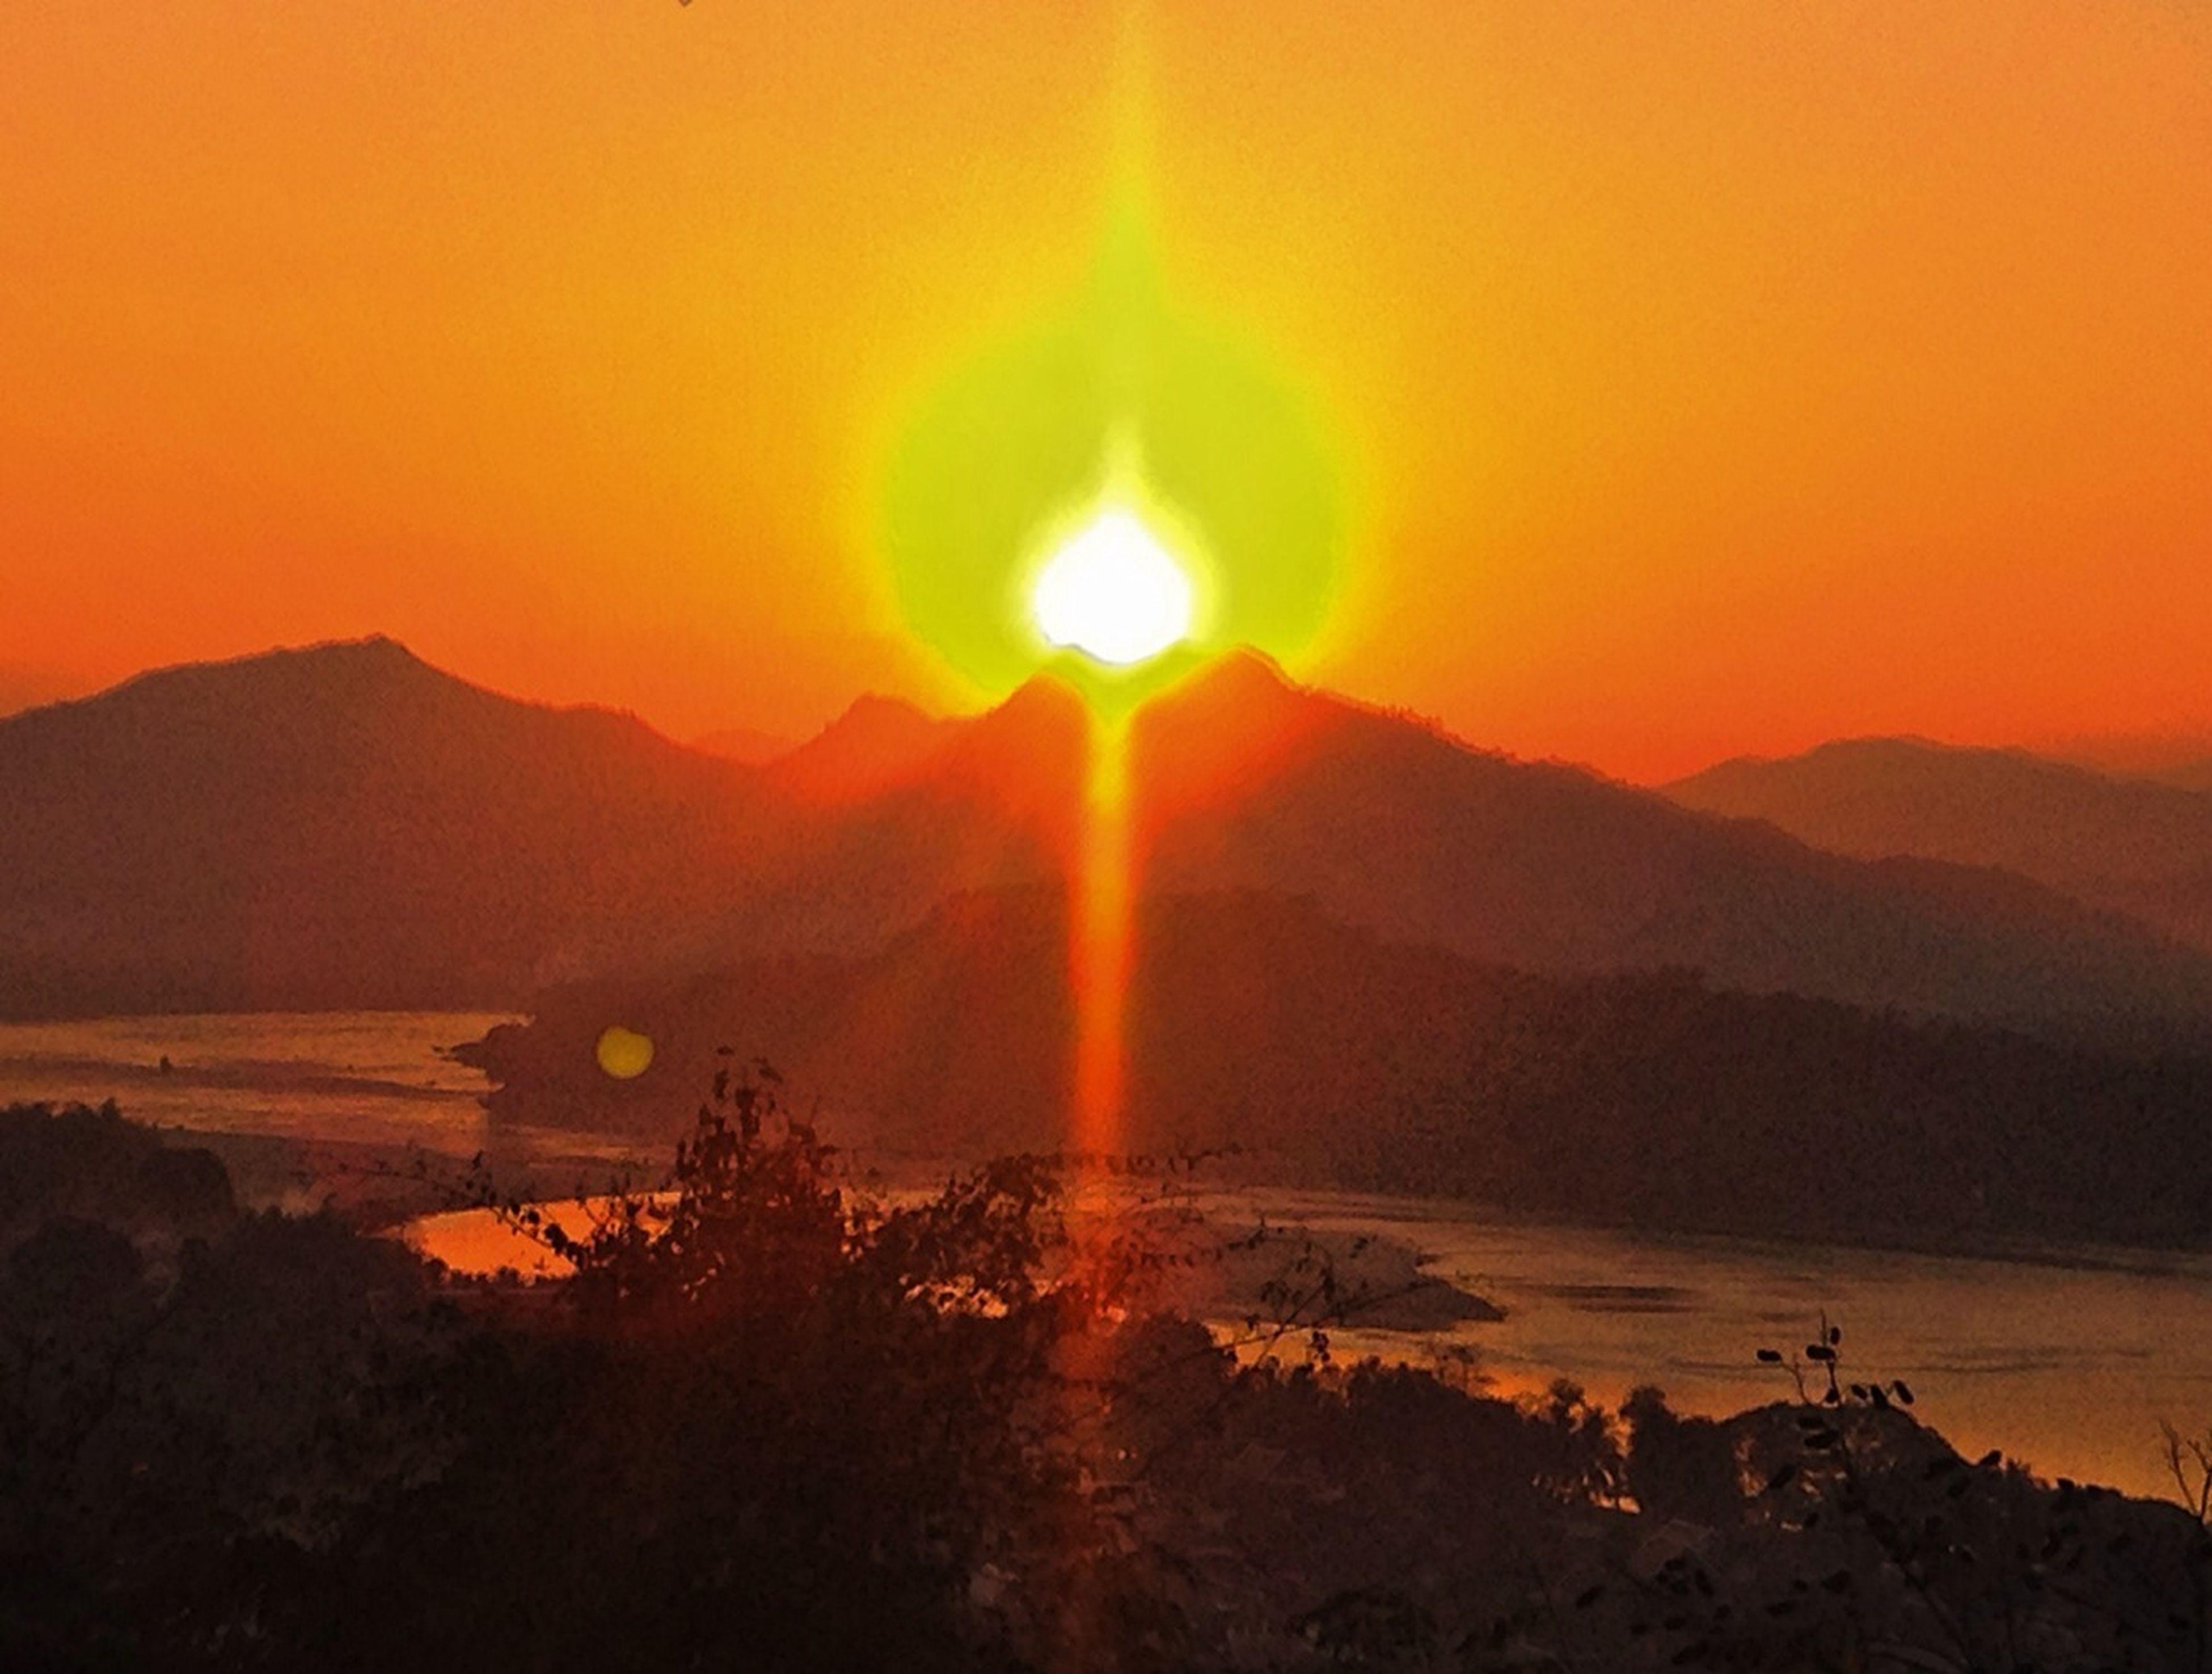 sunset, sun, mountain, tranquil scene, scenics, tranquility, orange color, beauty in nature, silhouette, sunlight, mountain range, idyllic, landscape, nature, sunbeam, sky, lens flare, non-urban scene, remote, outdoors